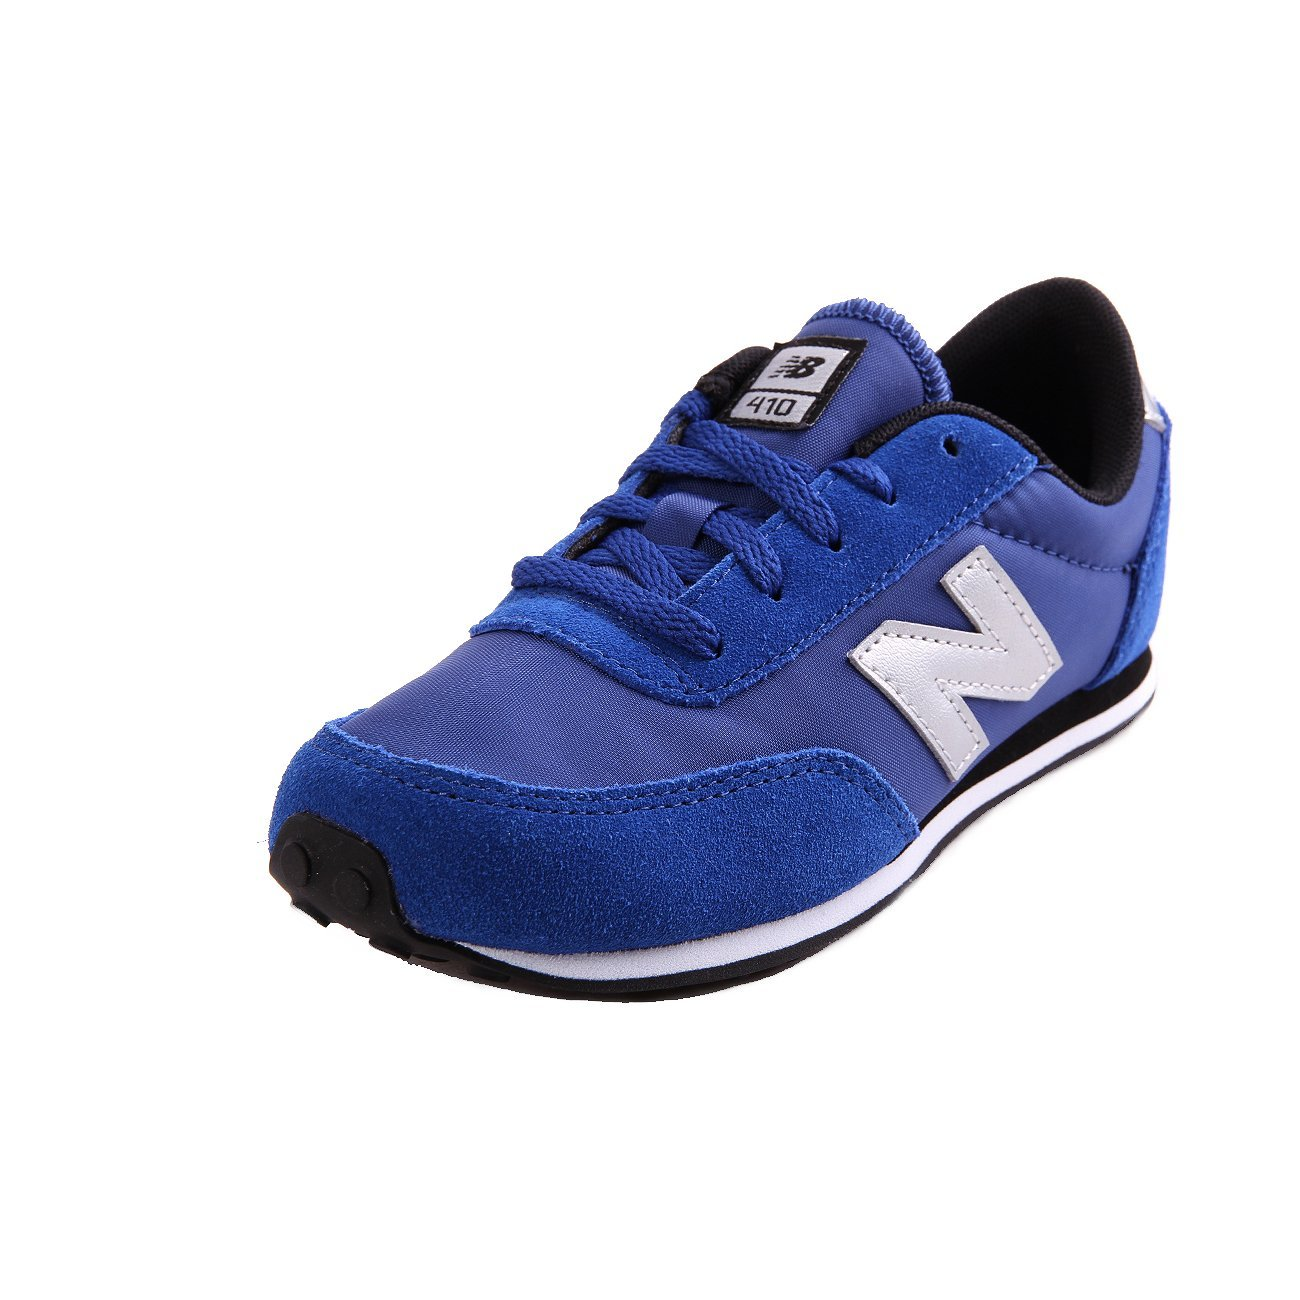 Argent Chaussures Sacs et KL Balance Buy New 32 Bleu 410 6qXz70